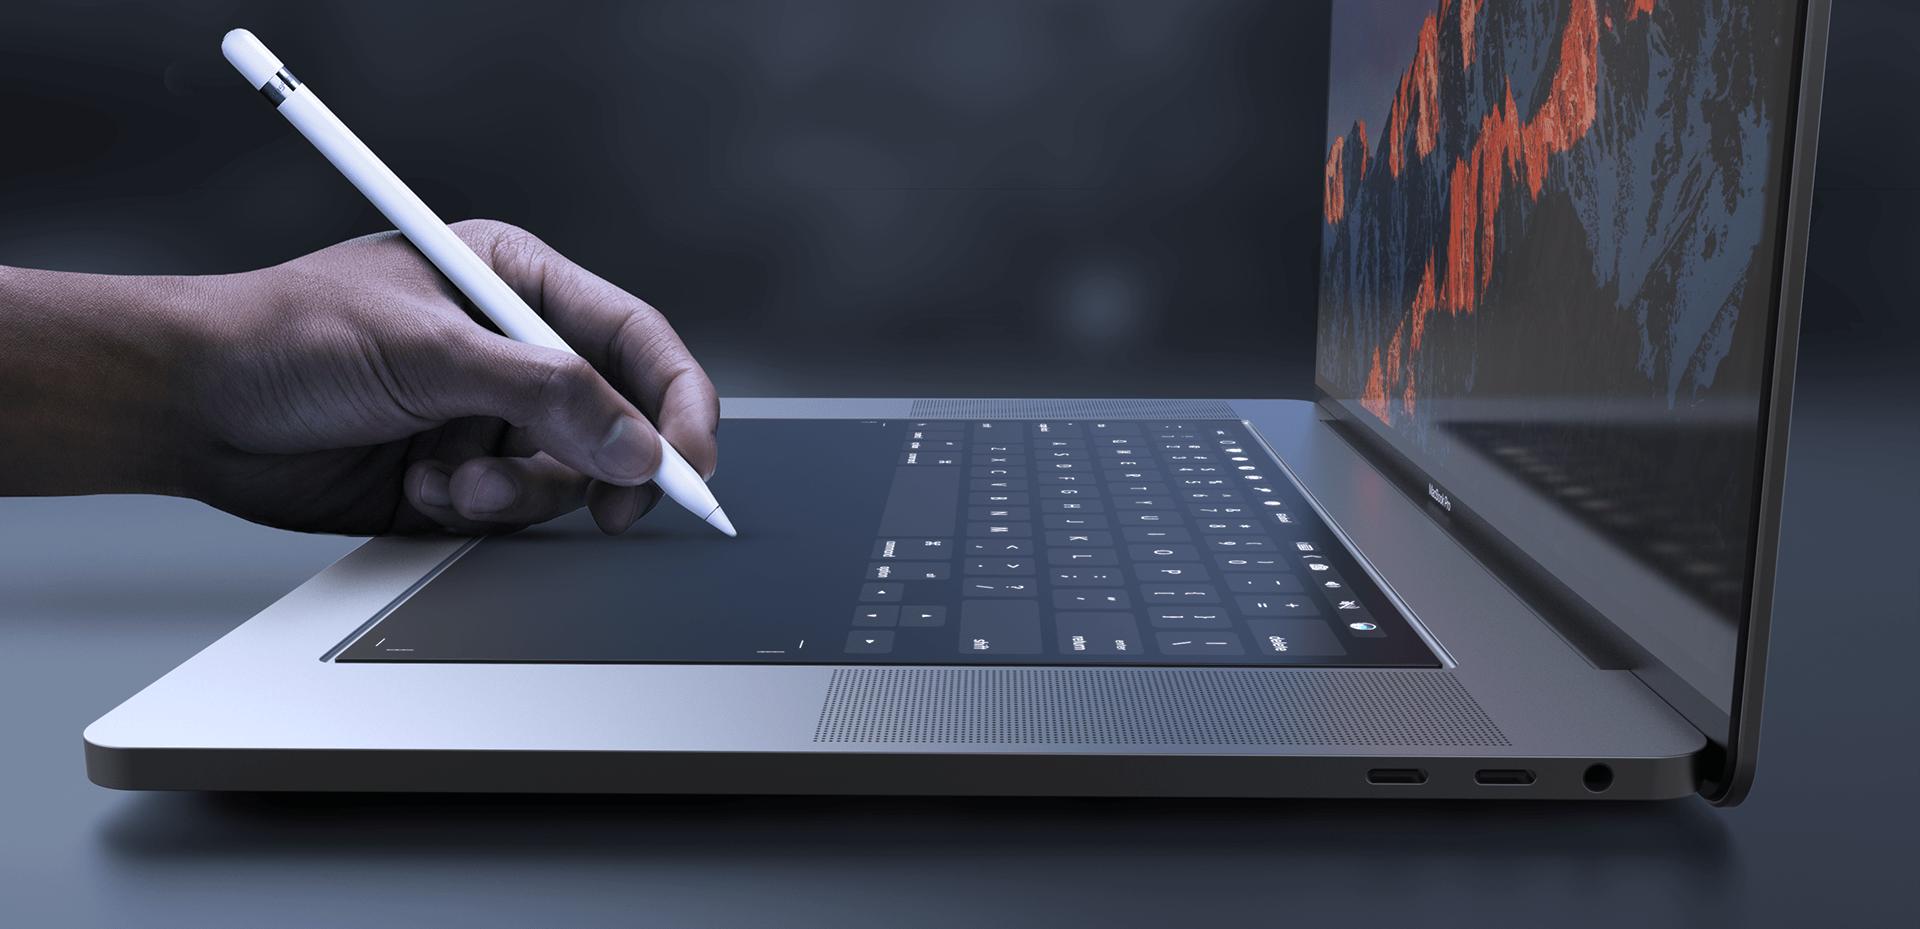 MacBook Pro 2018 Daniel Concept